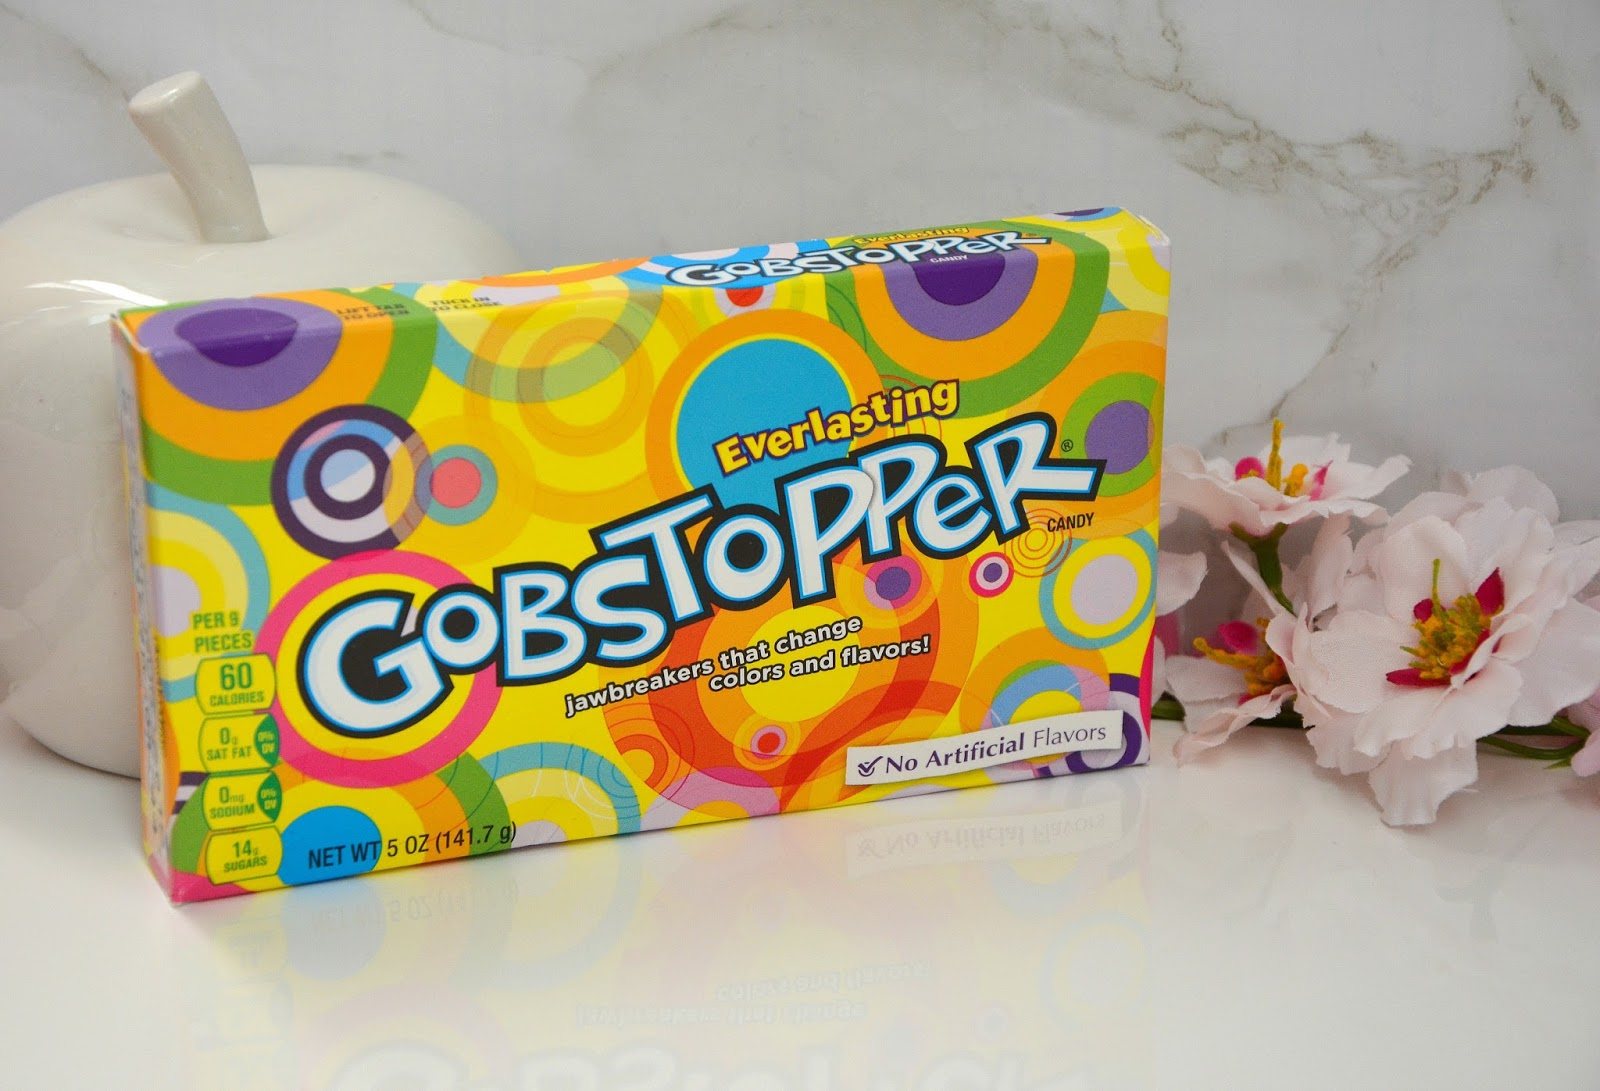 Gobstopper Nestlé